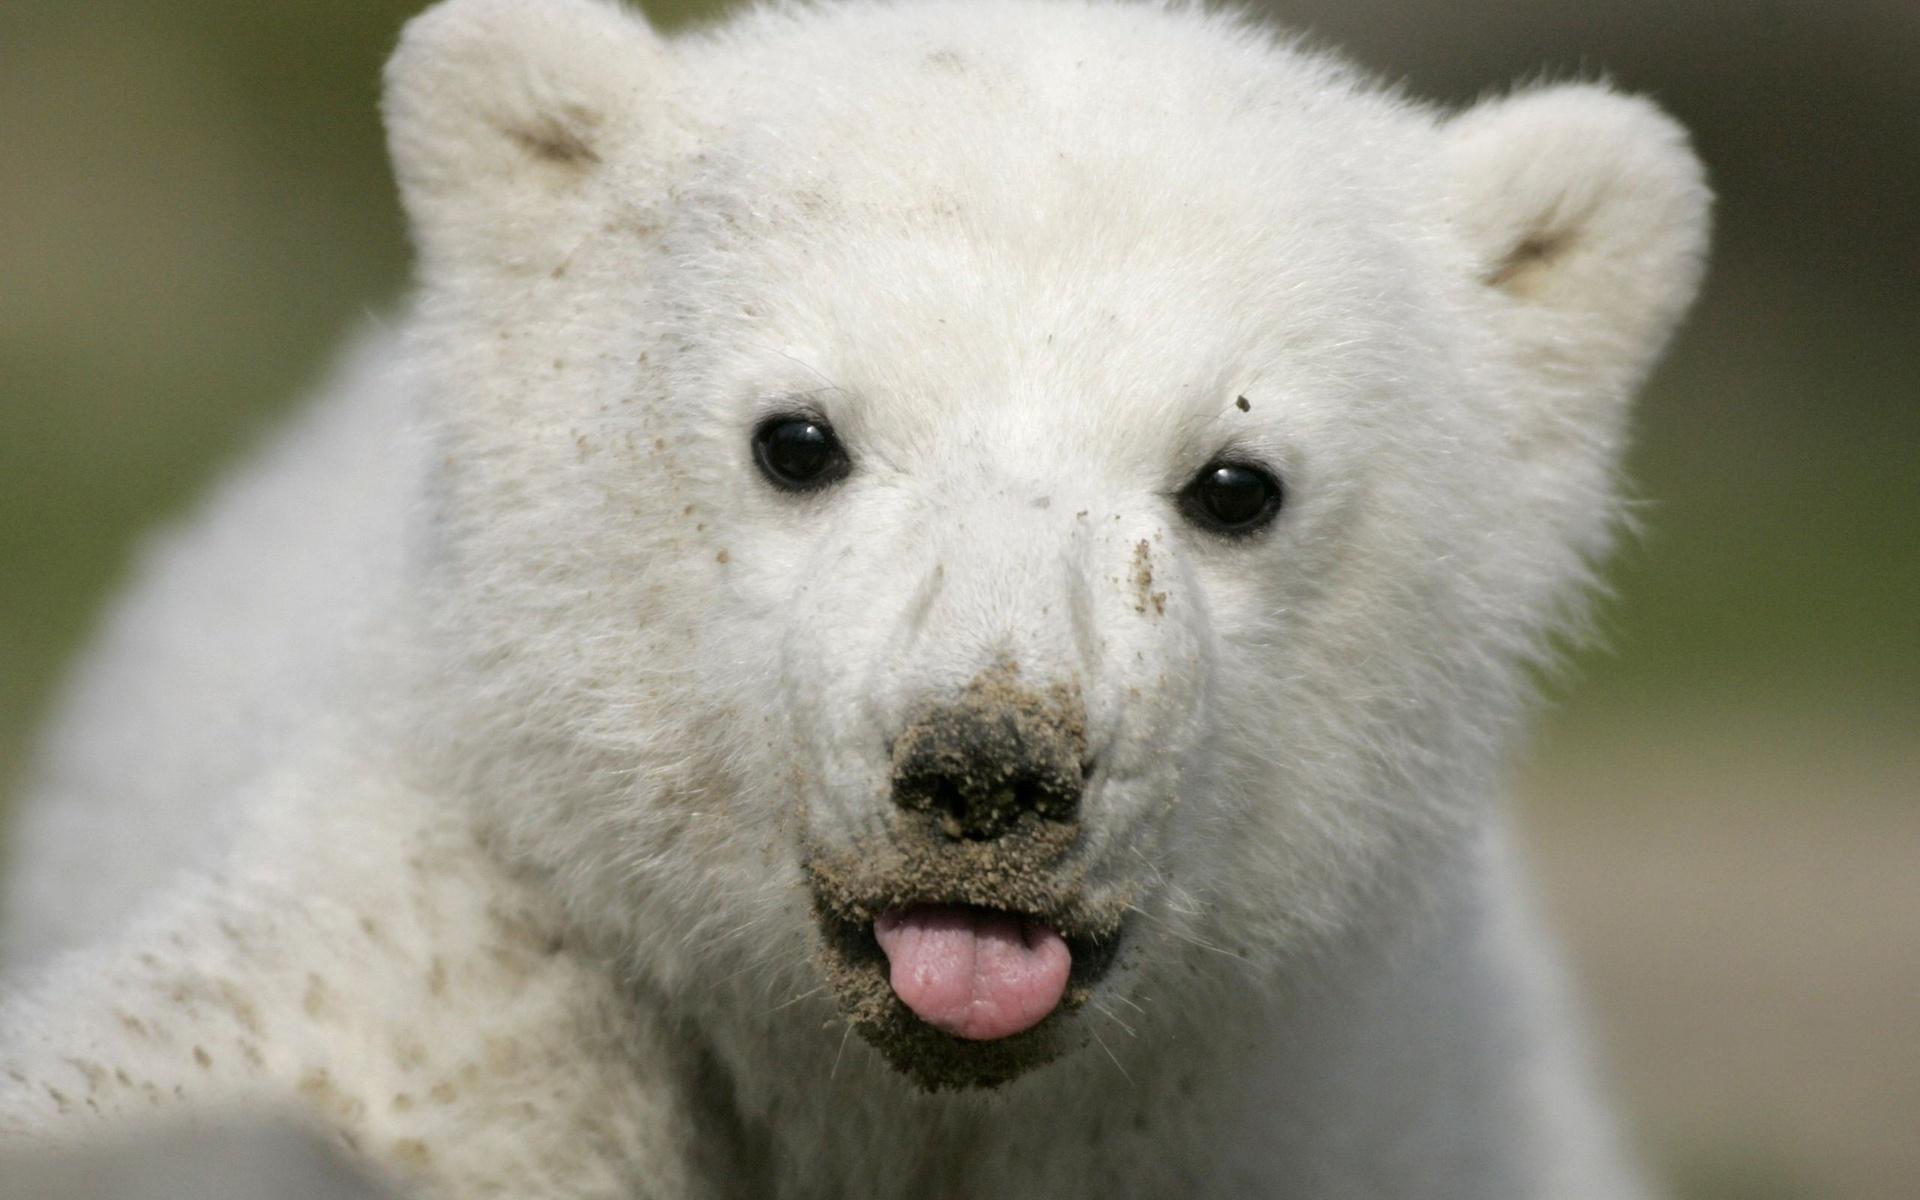 Wallpaper Abyss Explore the Collection Bears Animal Polar Bear 331358 1920x1200